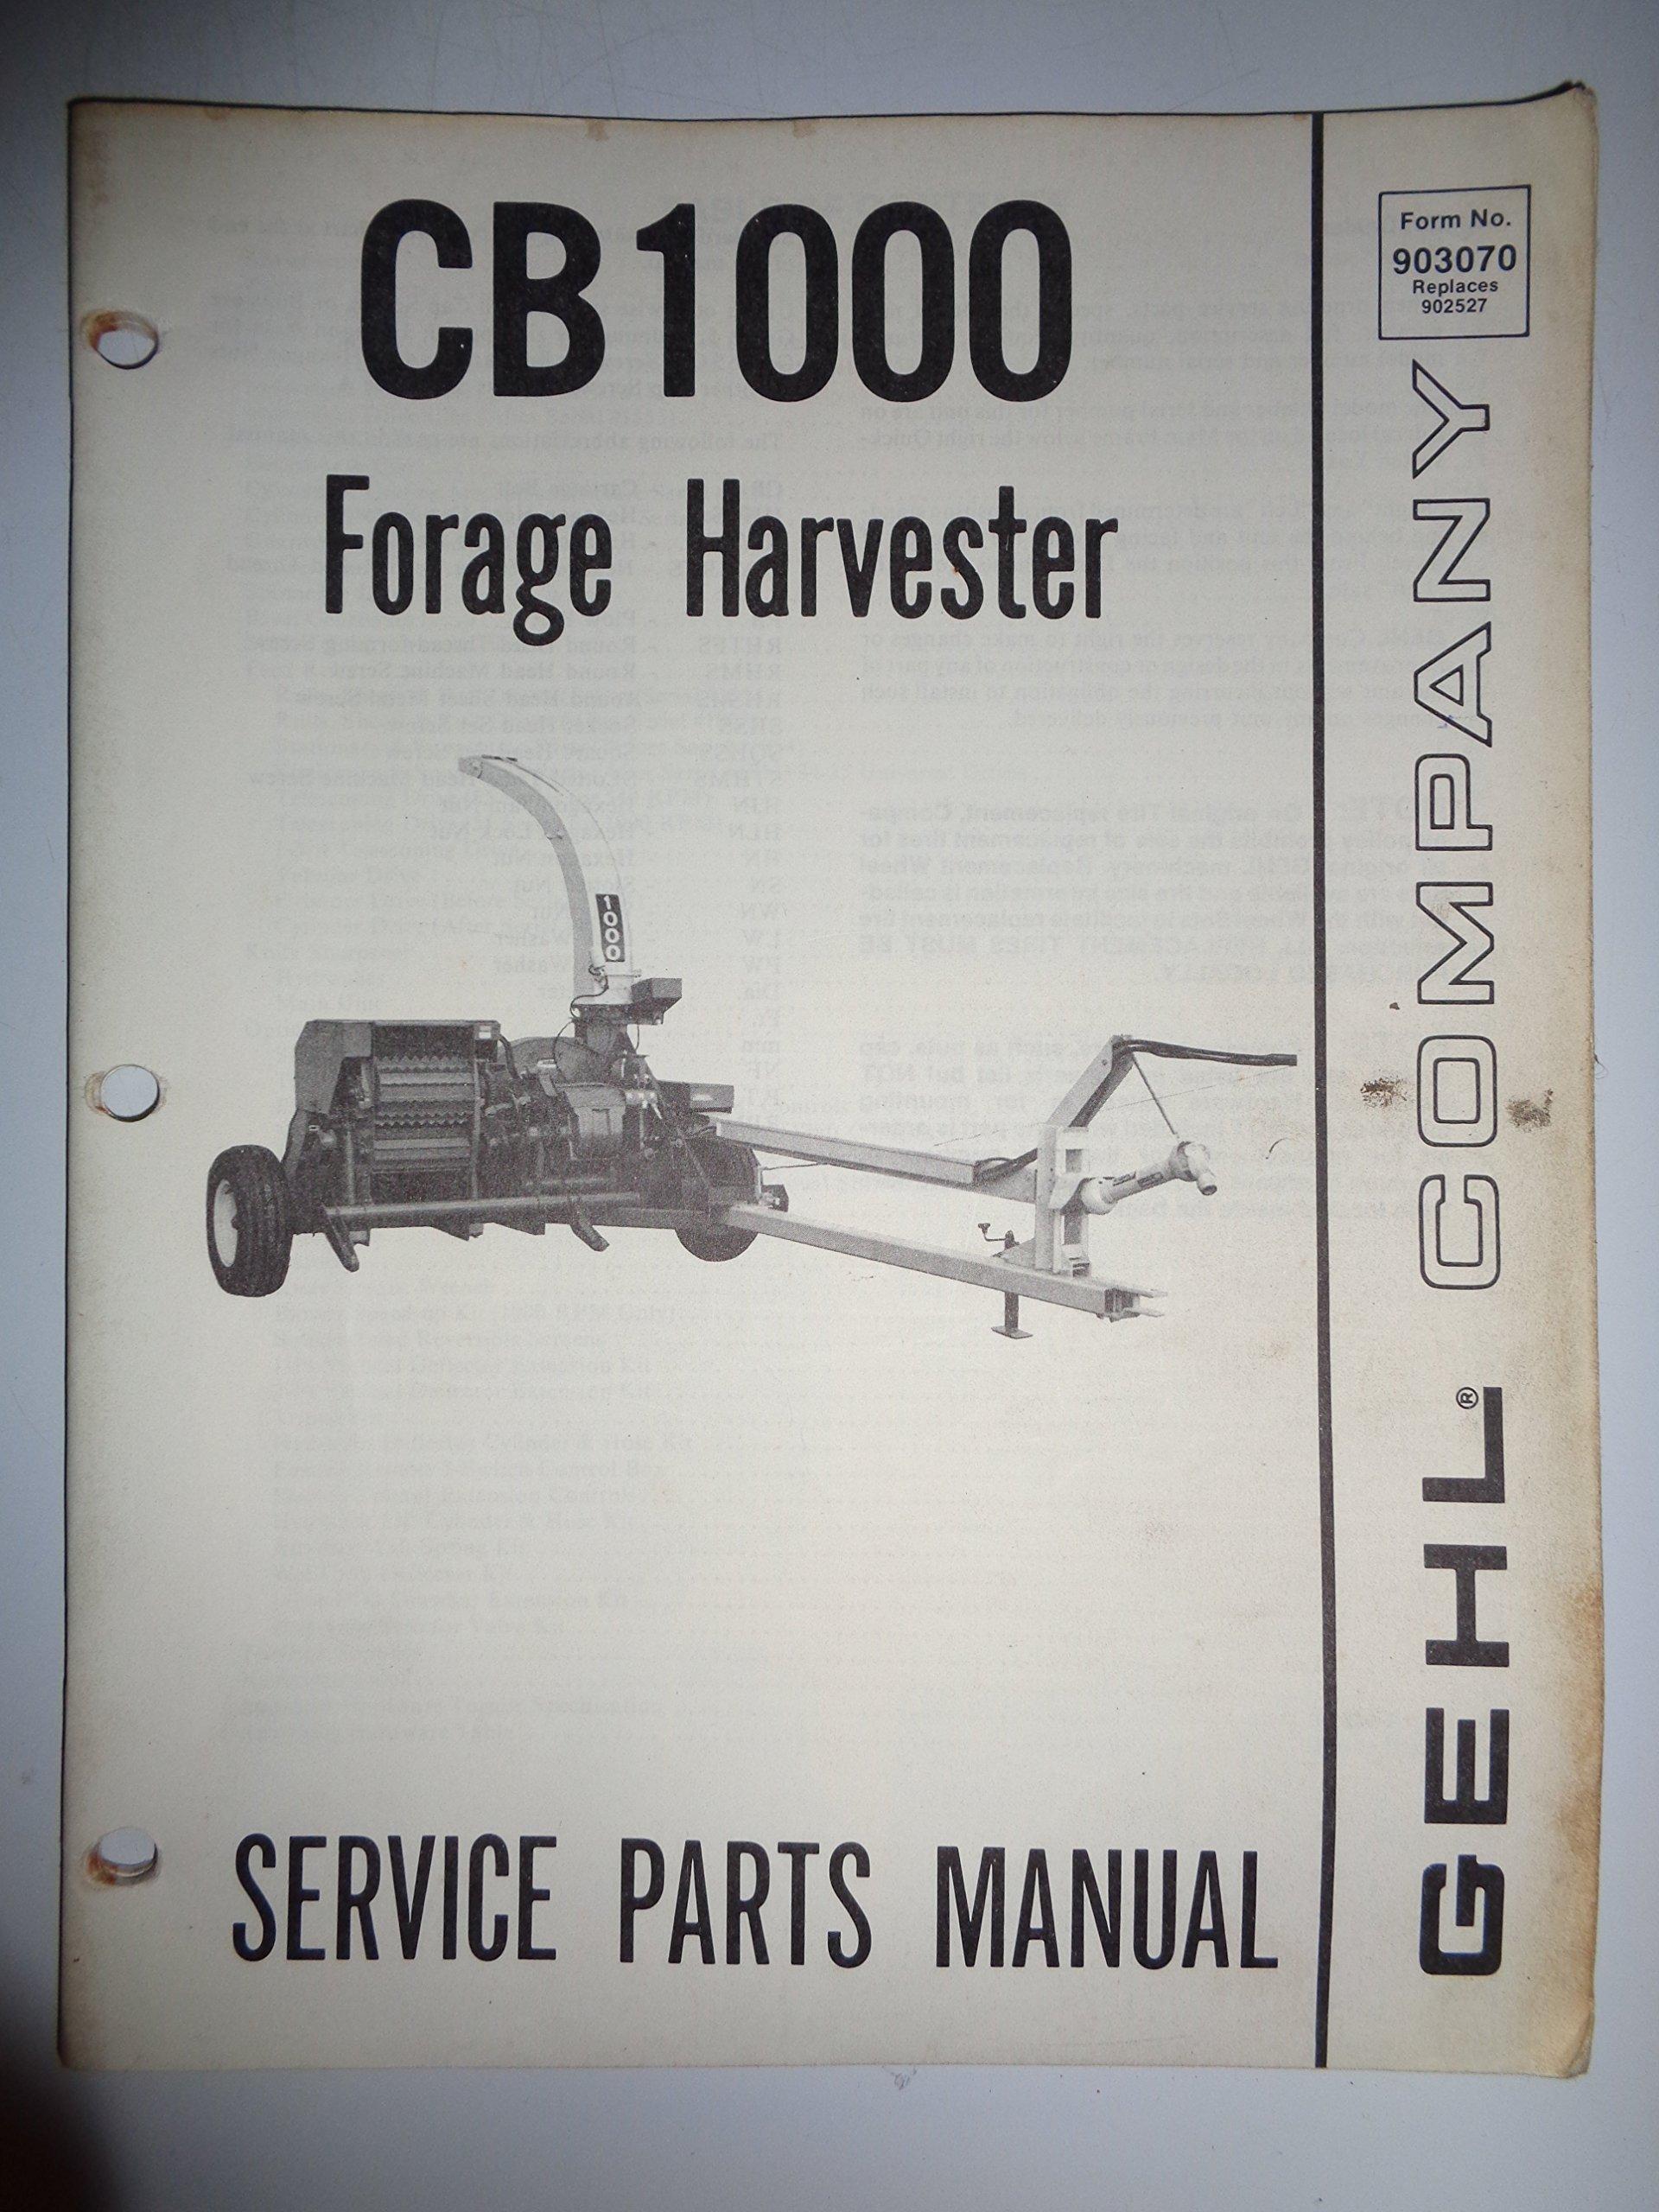 Gehl CB 1000 Forage Harvester Parts Catalog Book Manual 5/80: Gehl: Amazon